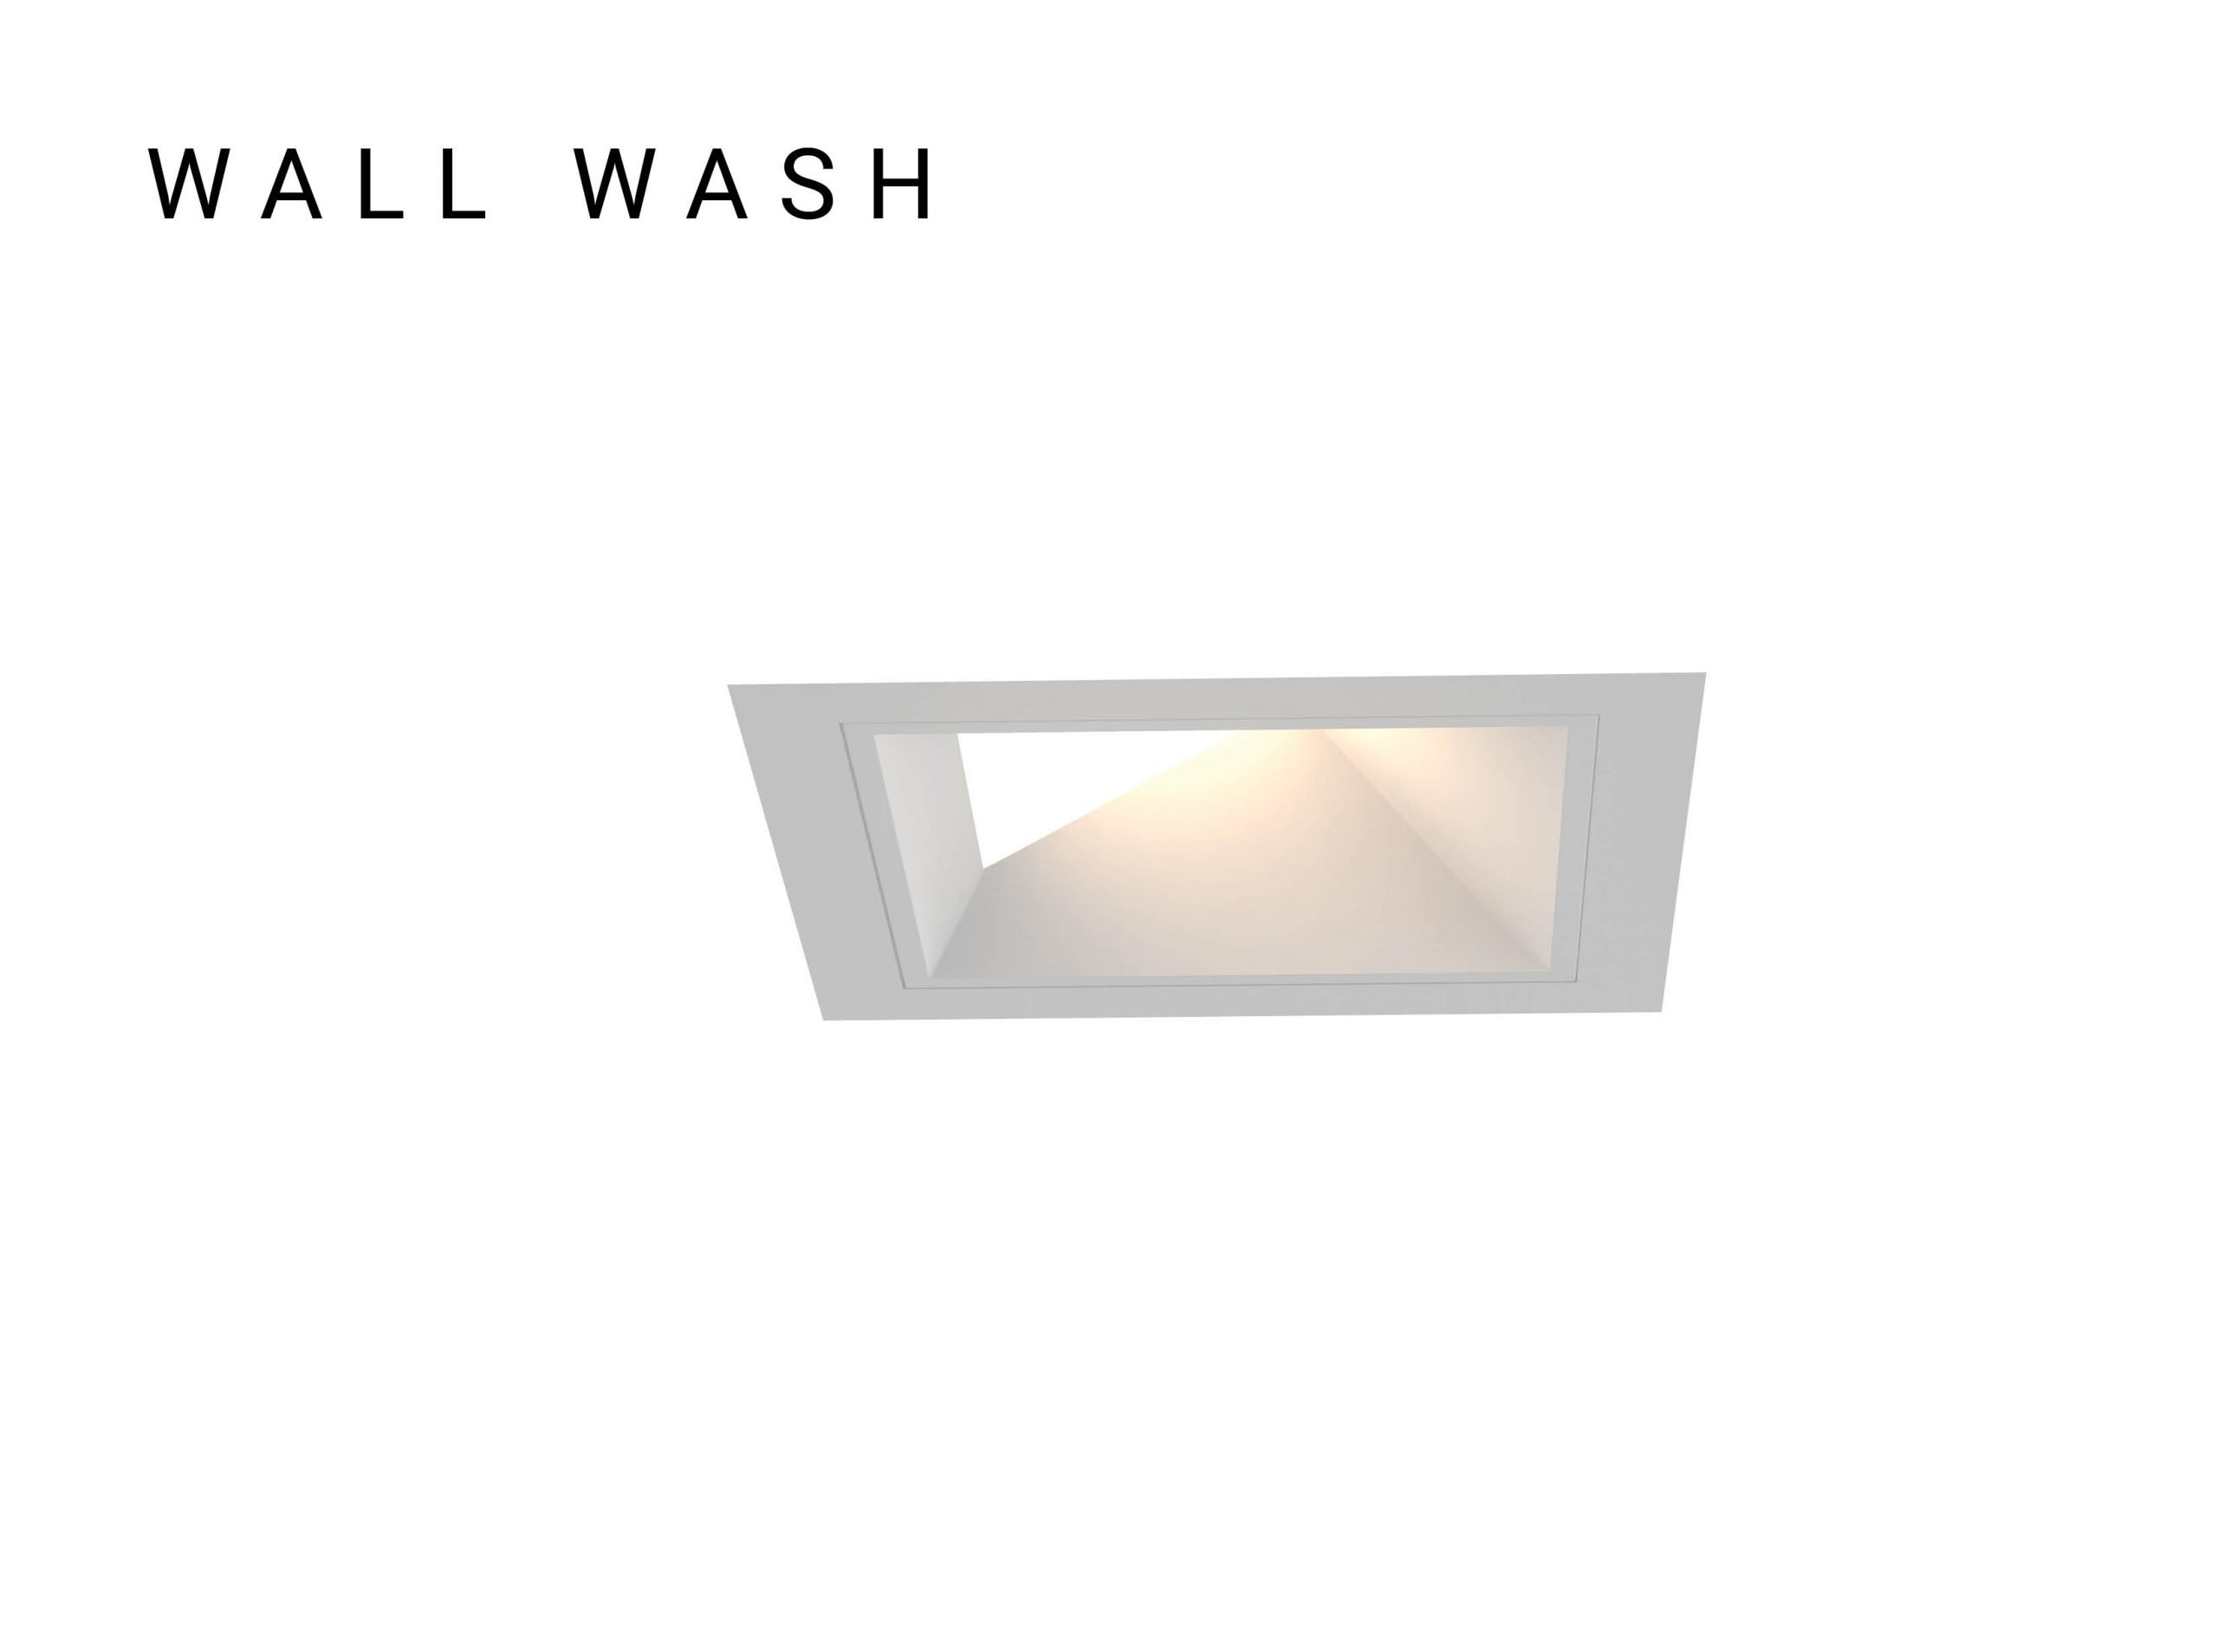 Bravo_WALL WASH_Banner_01